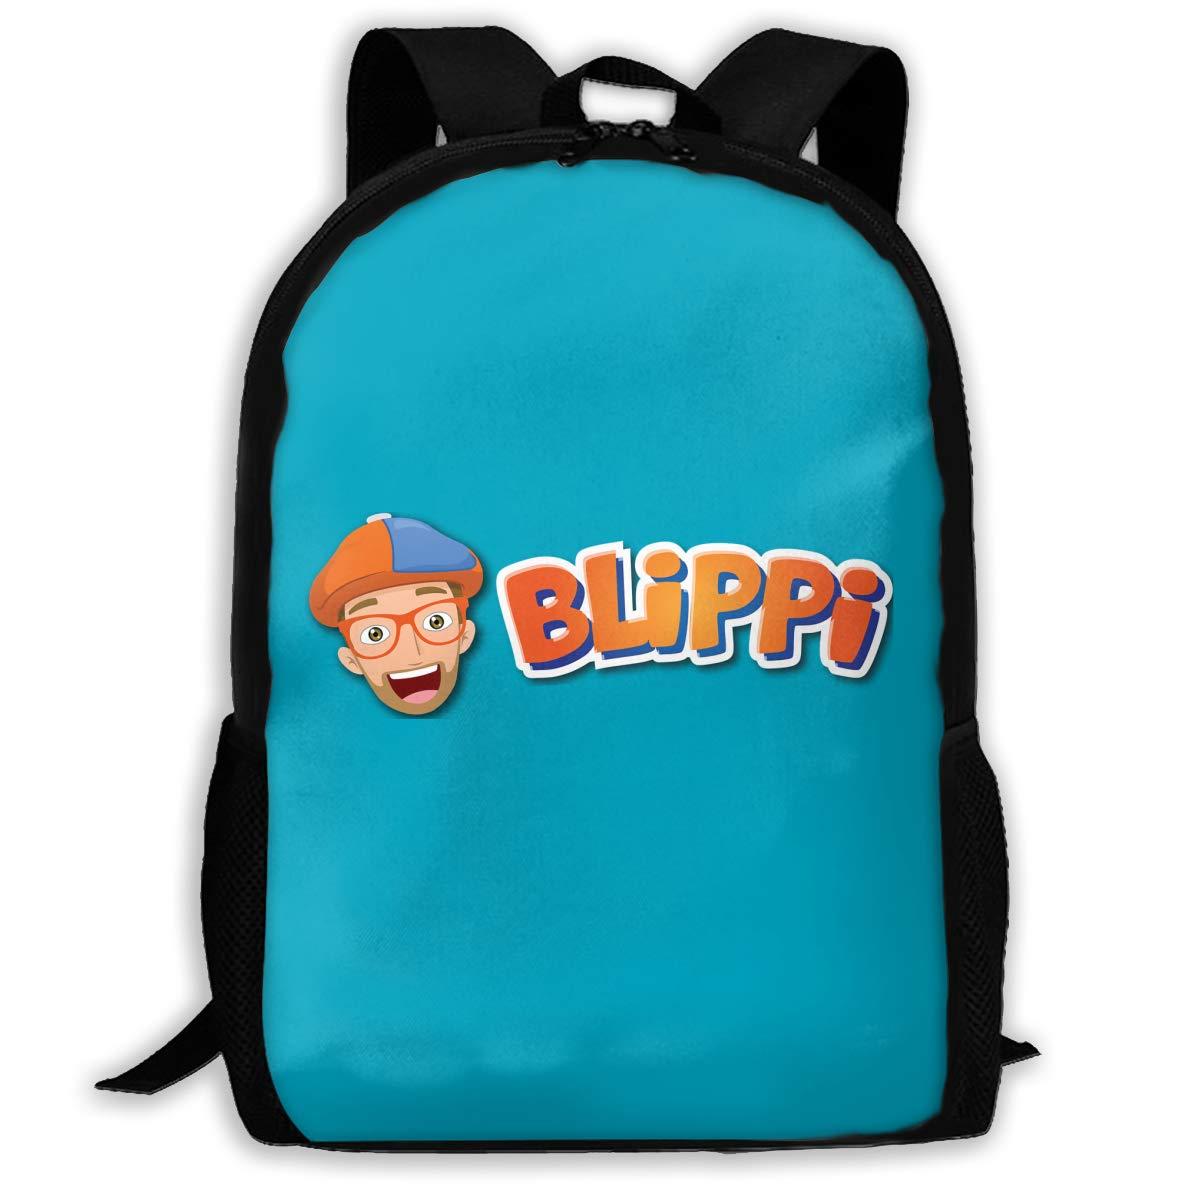 Amazon.com: Laoshi Crafty Blippi Mochila grande para niños y ...